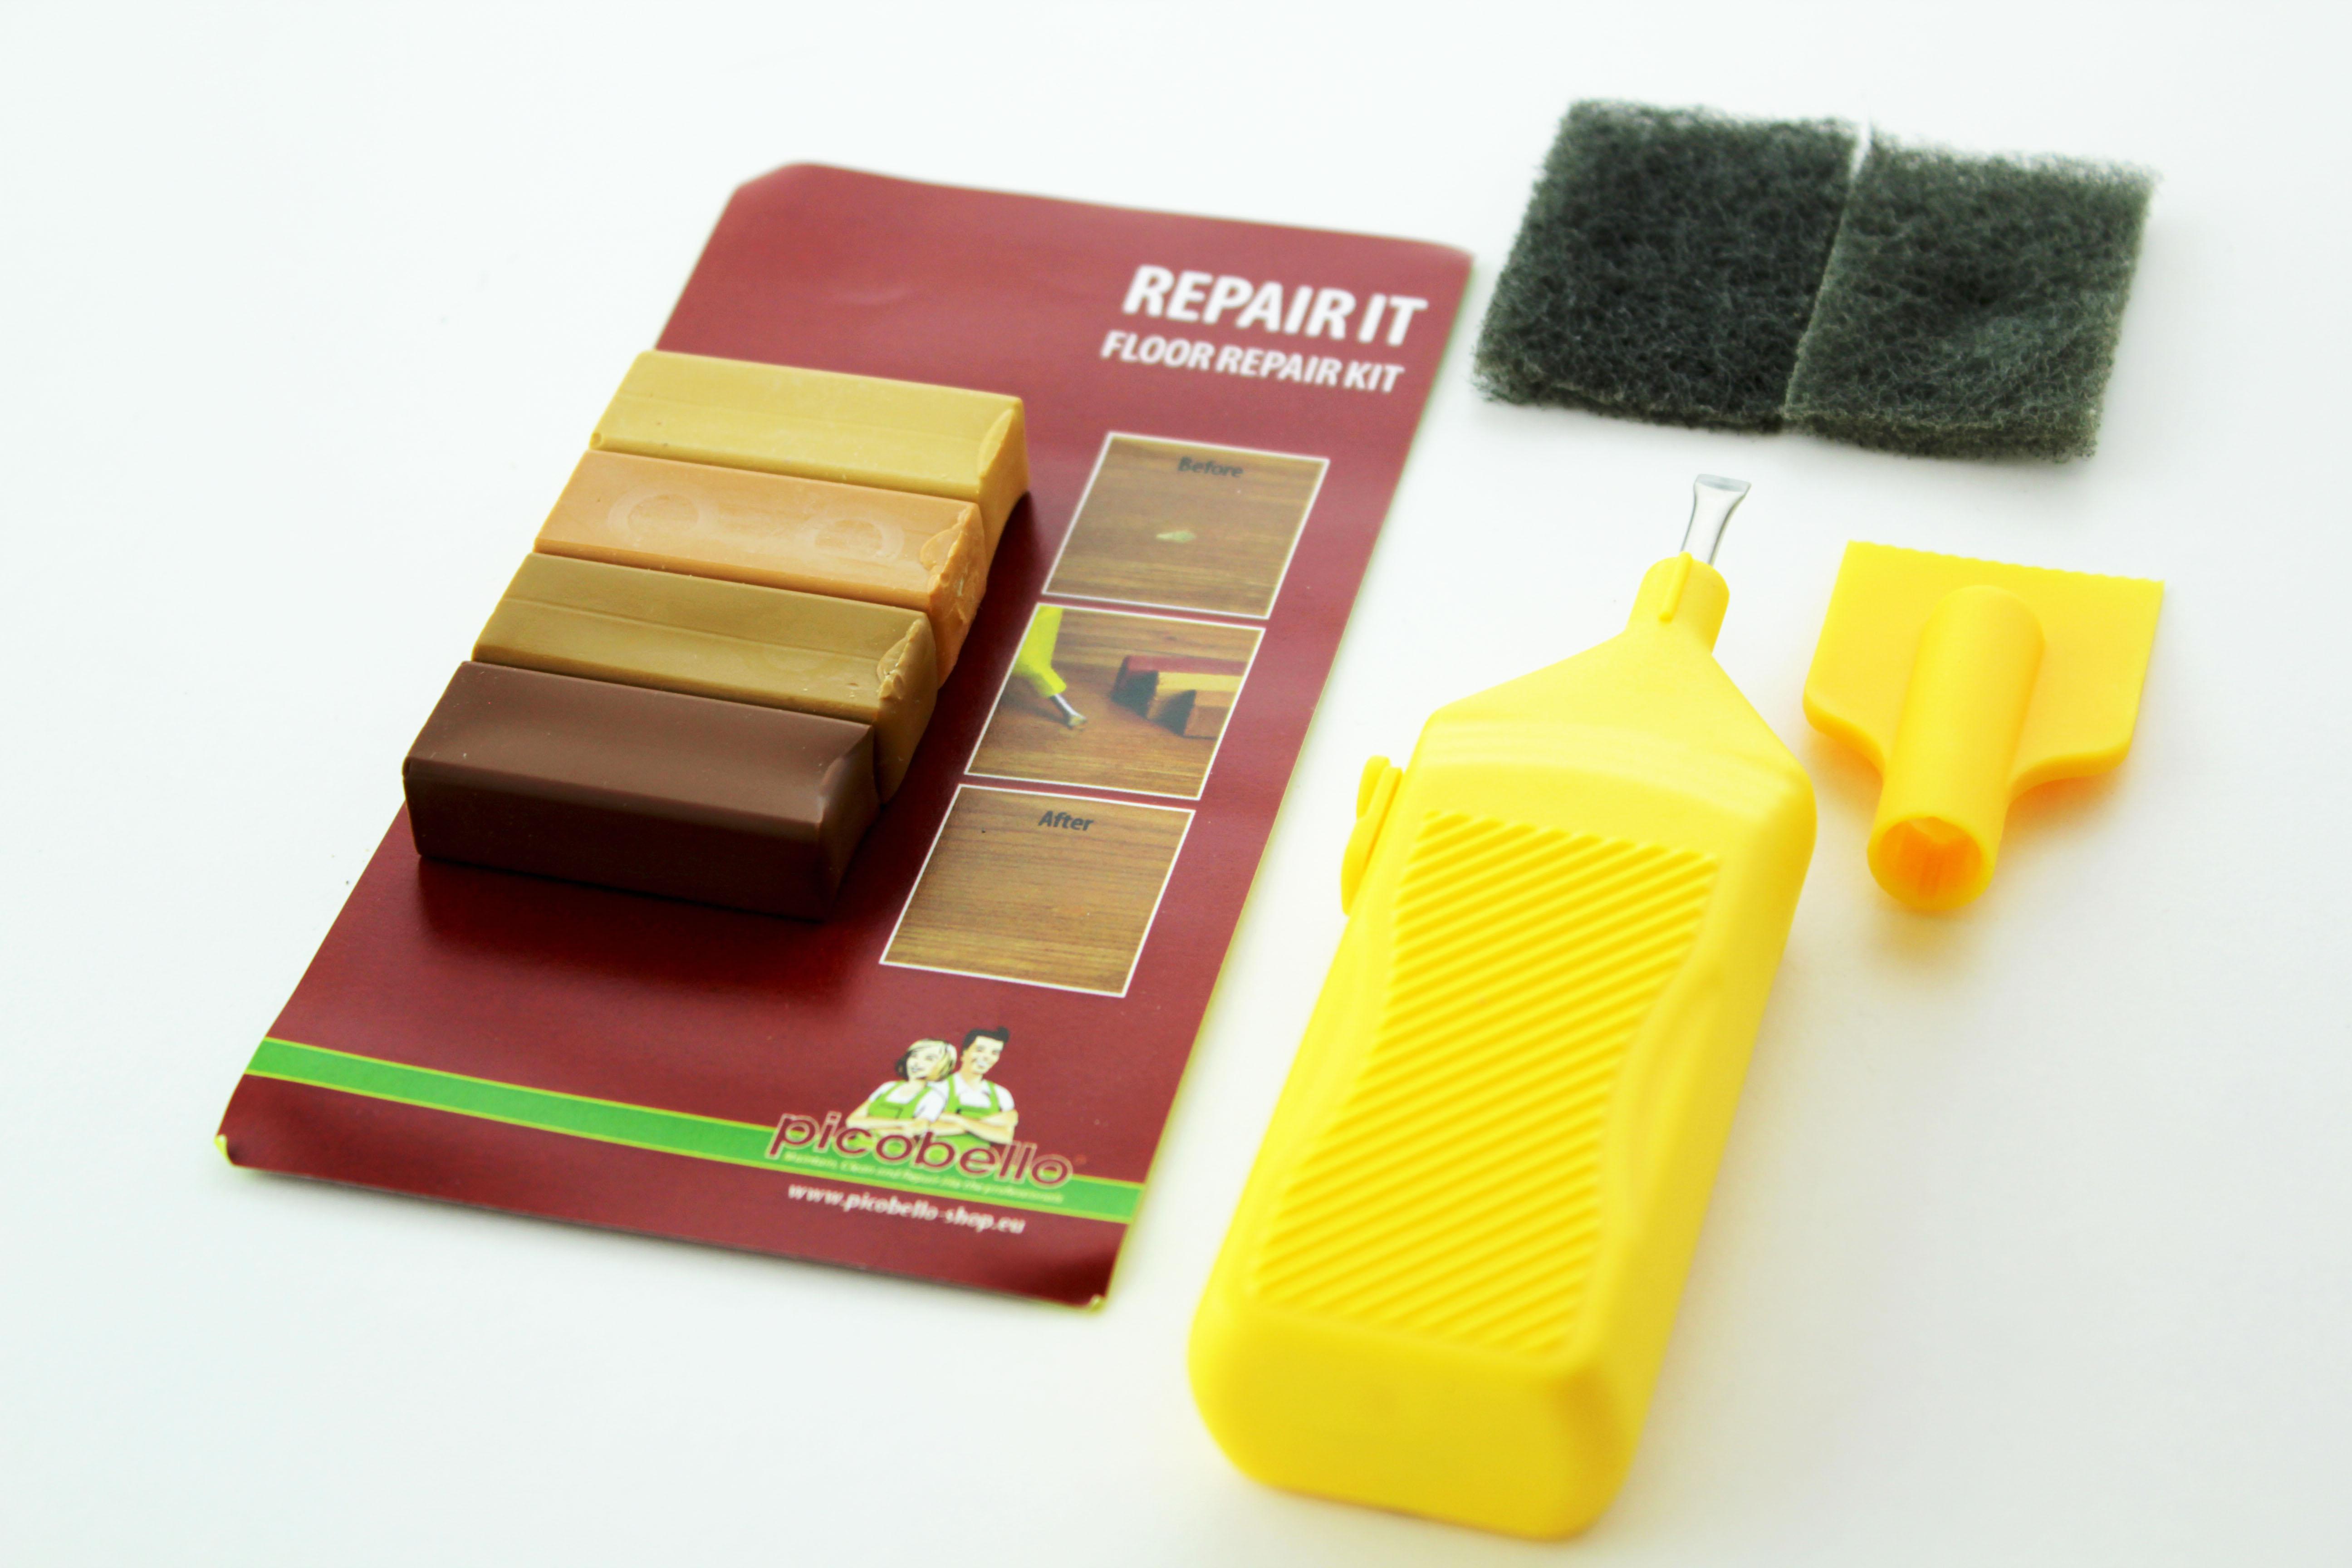 Repair It Set Wood Floor Scratch, Picobello Laminate Flooring Repair Kit